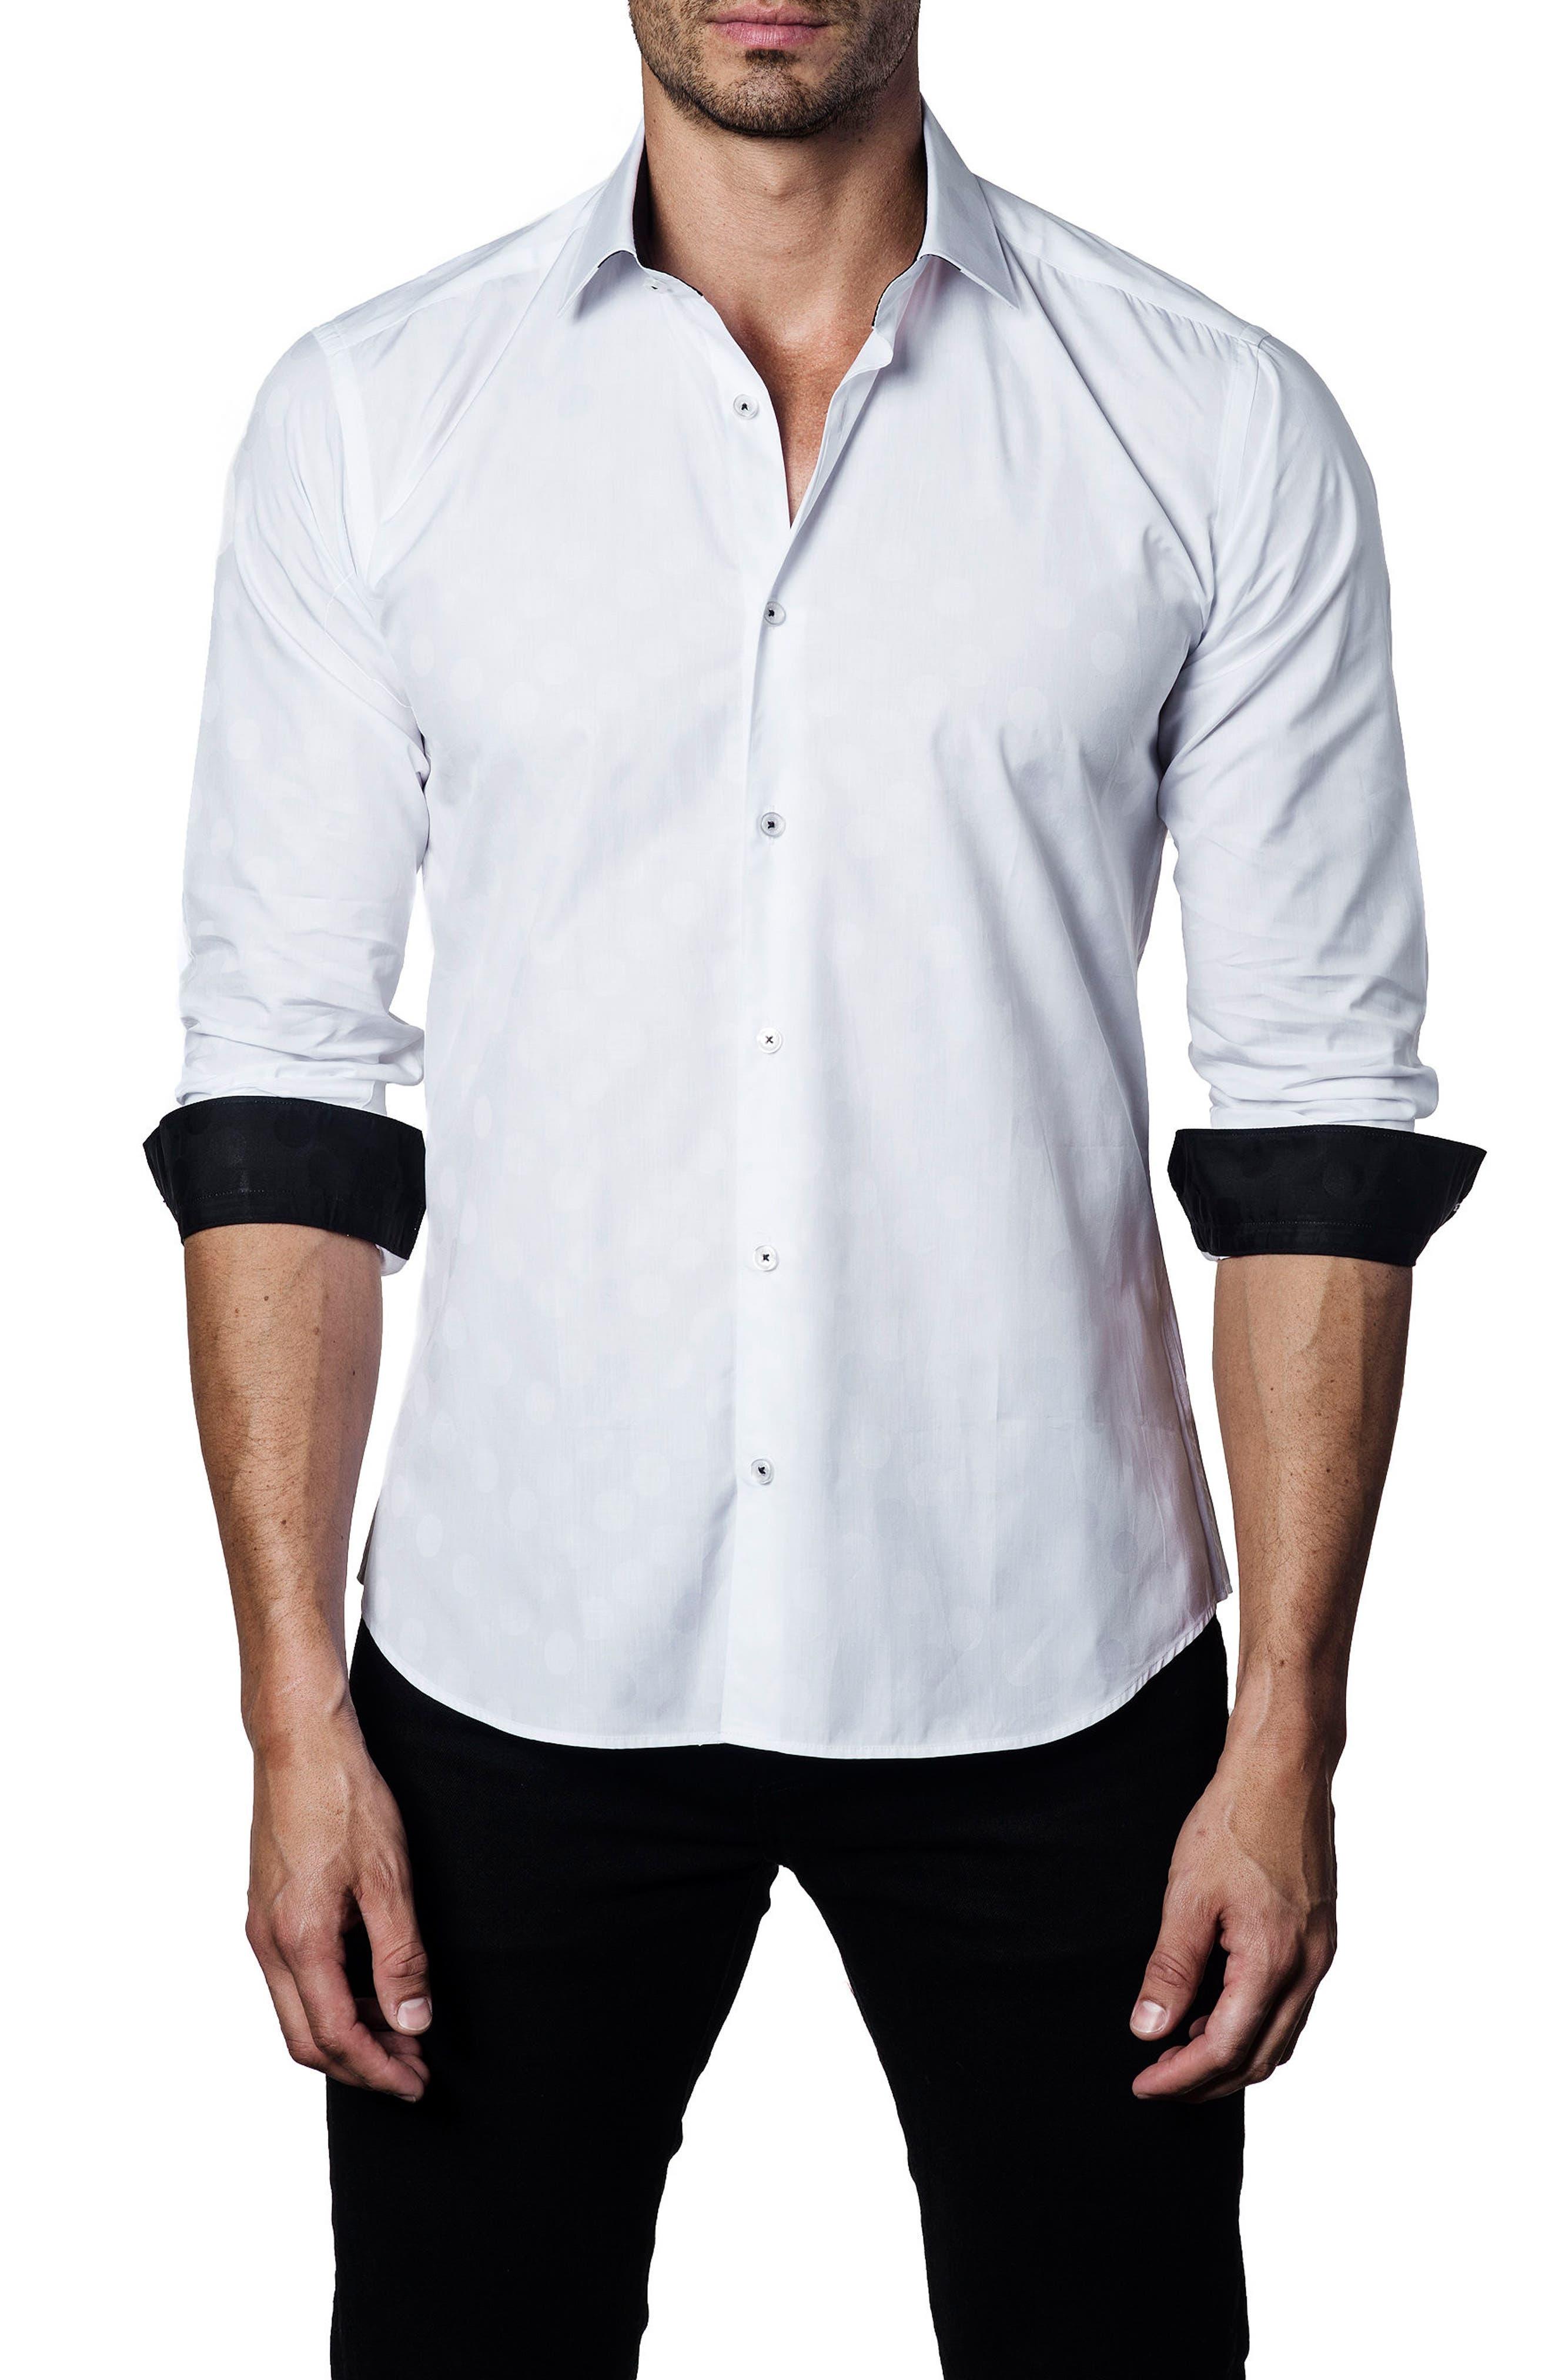 Solid Sport Shirt,                             Main thumbnail 1, color,                             White Polka Dot Jacquard